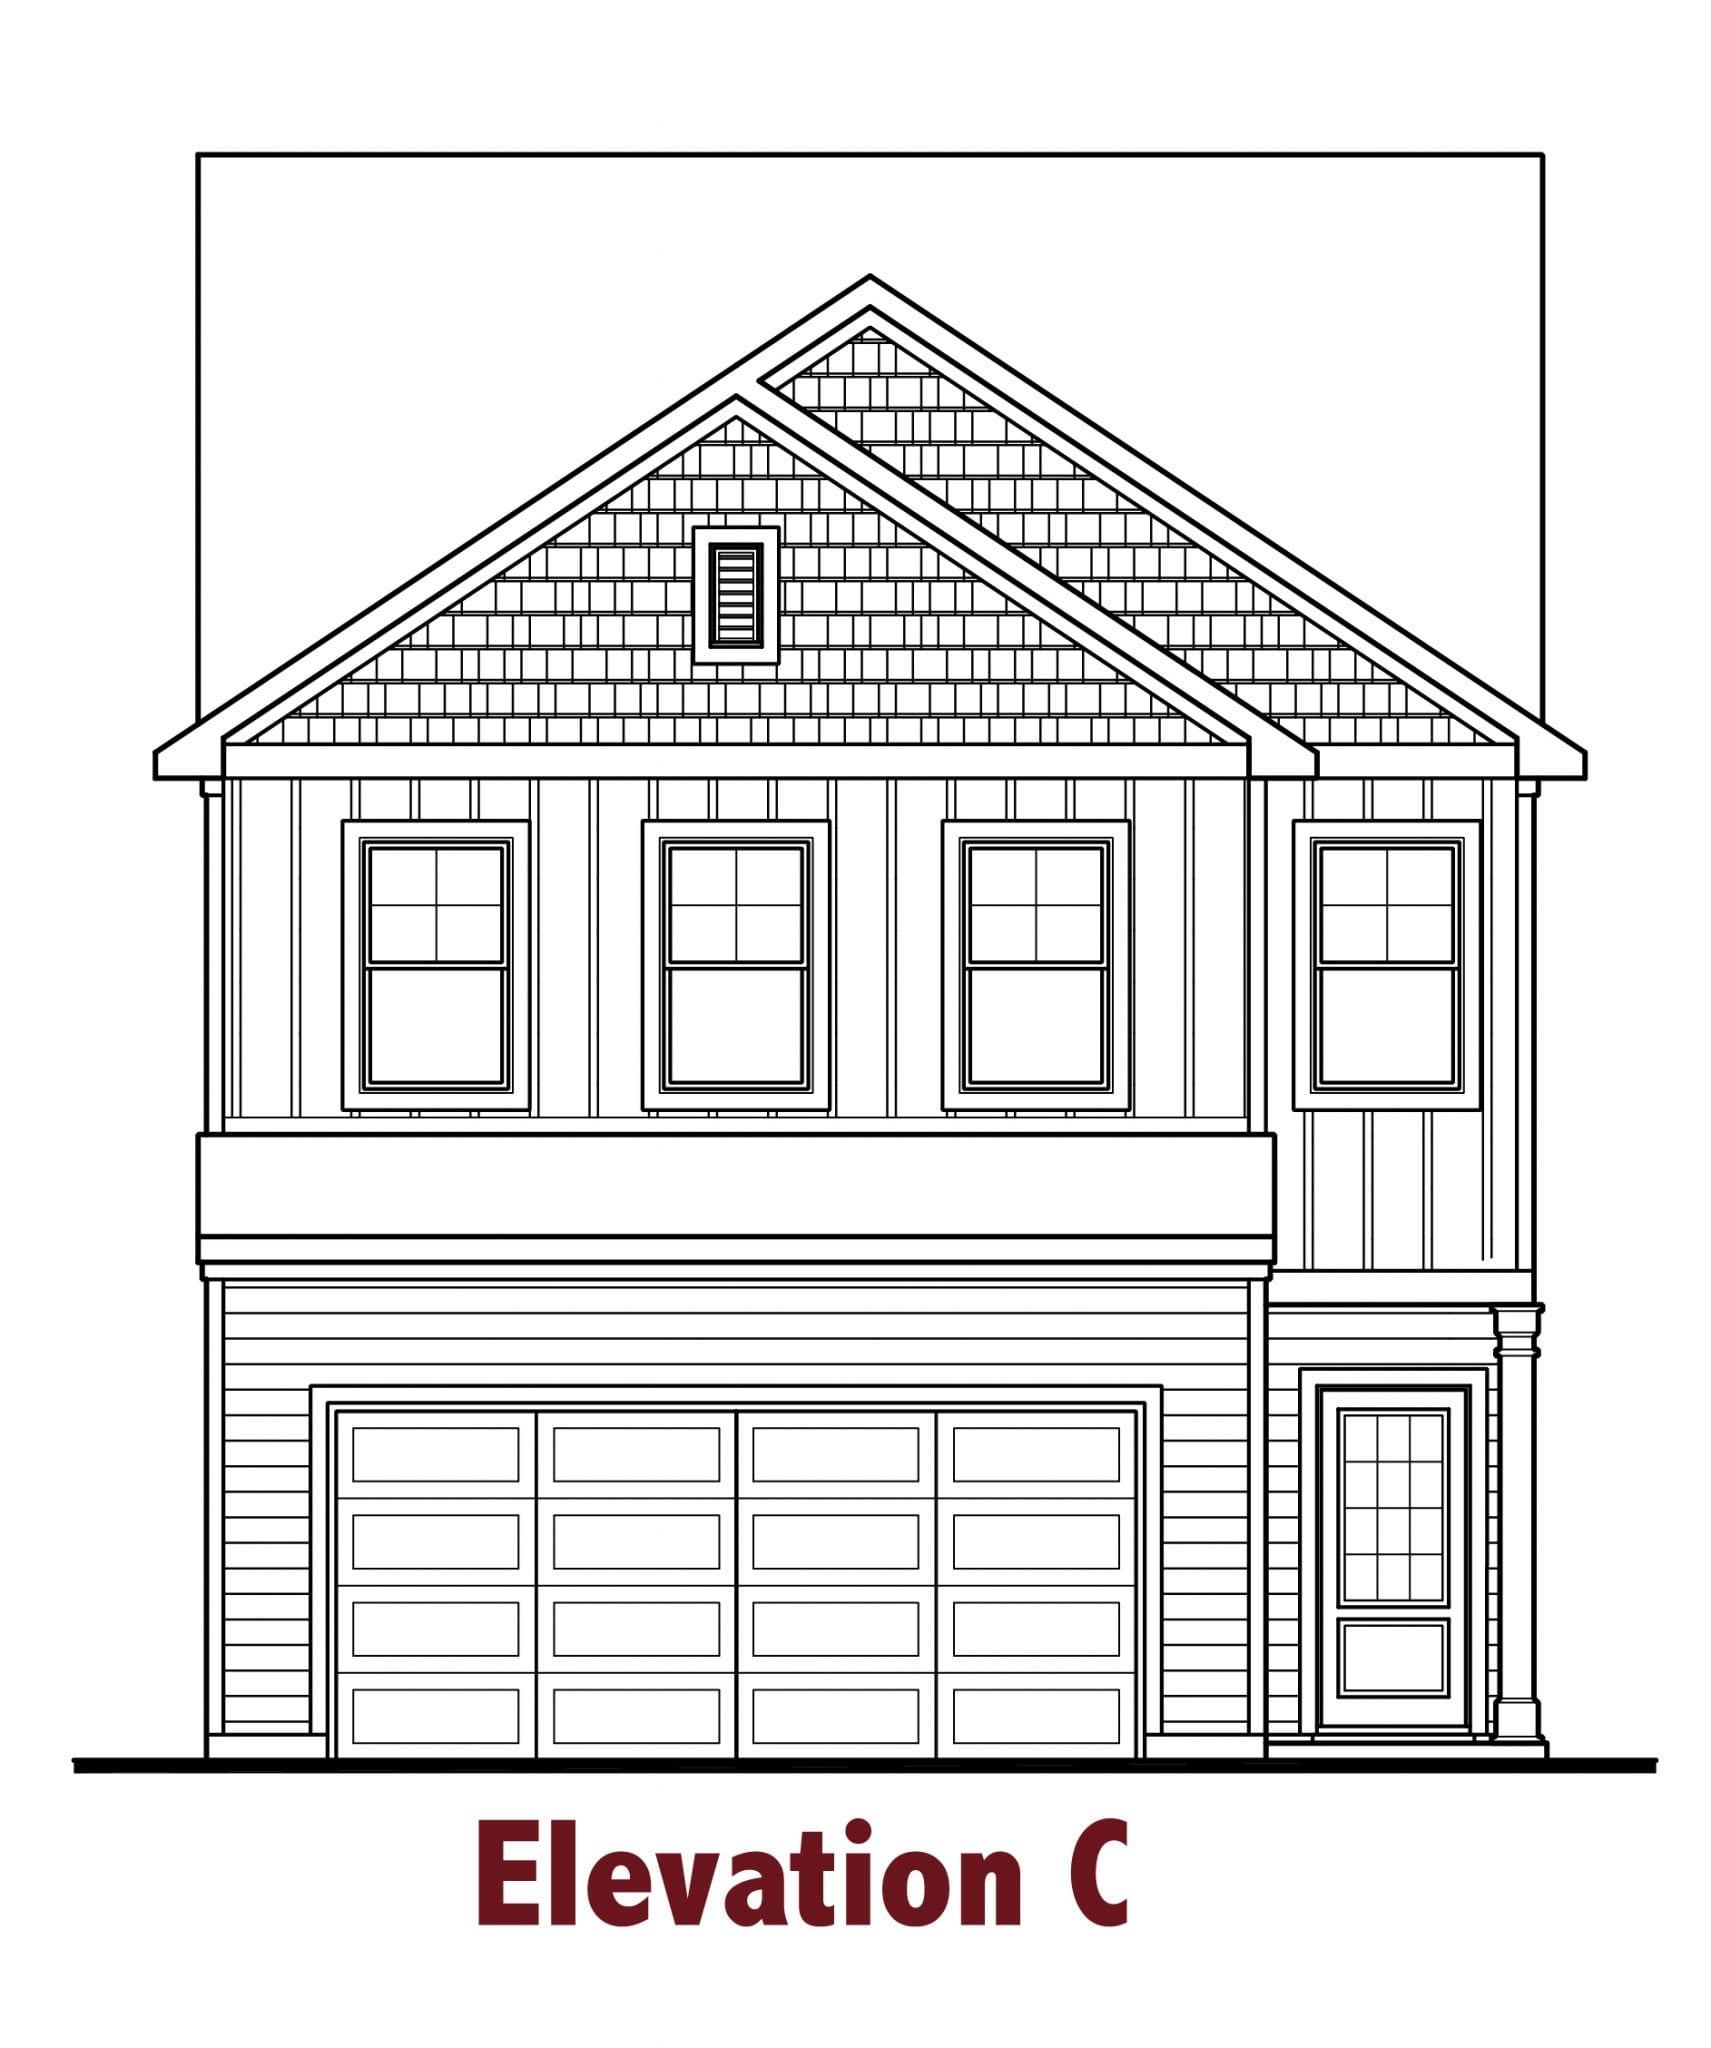 Fairfield elevations Image